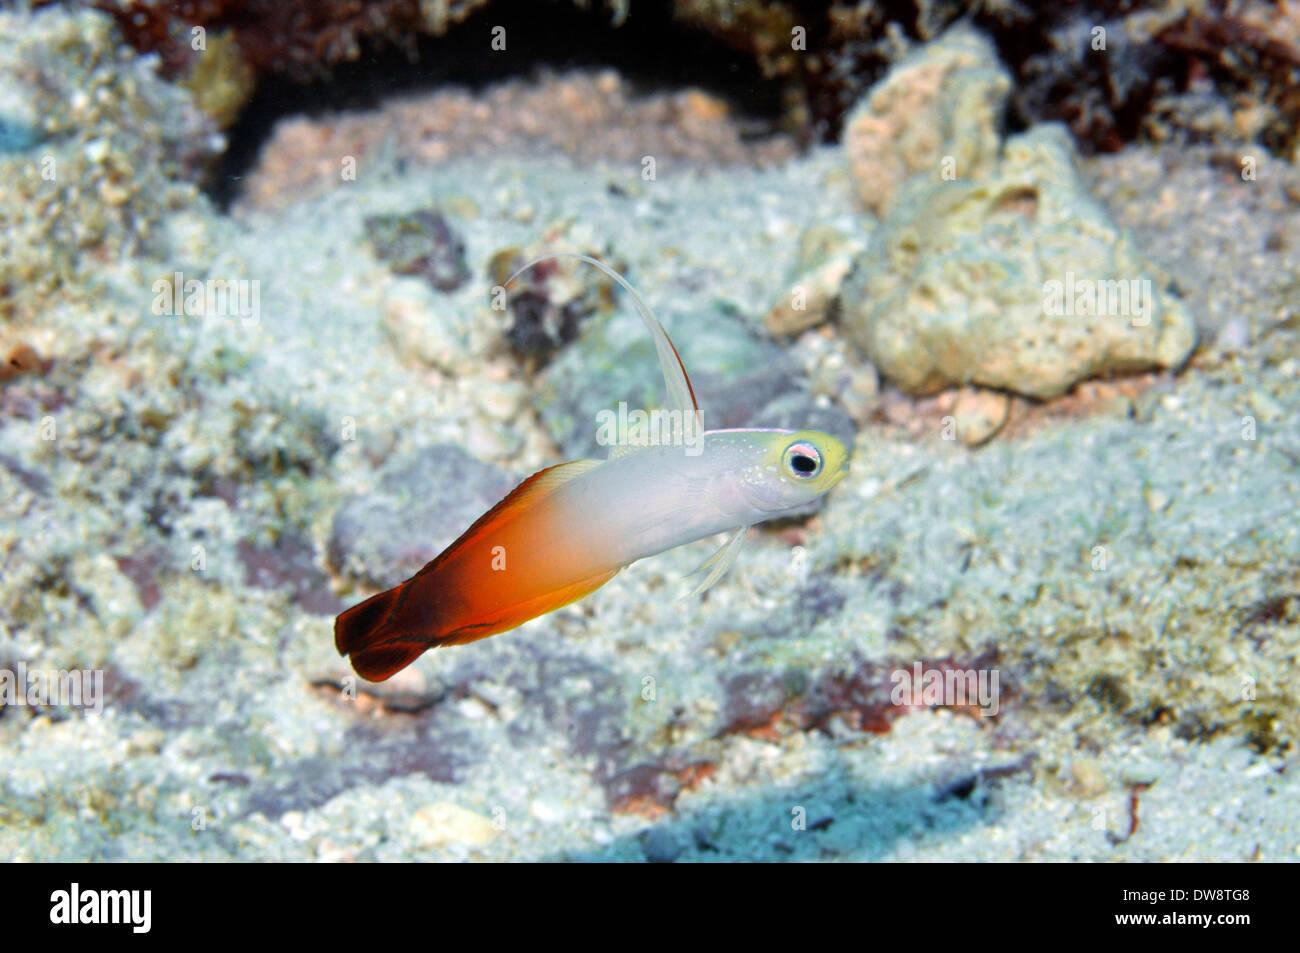 Fire dartfish, Nemateleotris magnifica, Avatolu dive site, Wallis Island, Wallis and Futuna, South Pacific - Stock Image